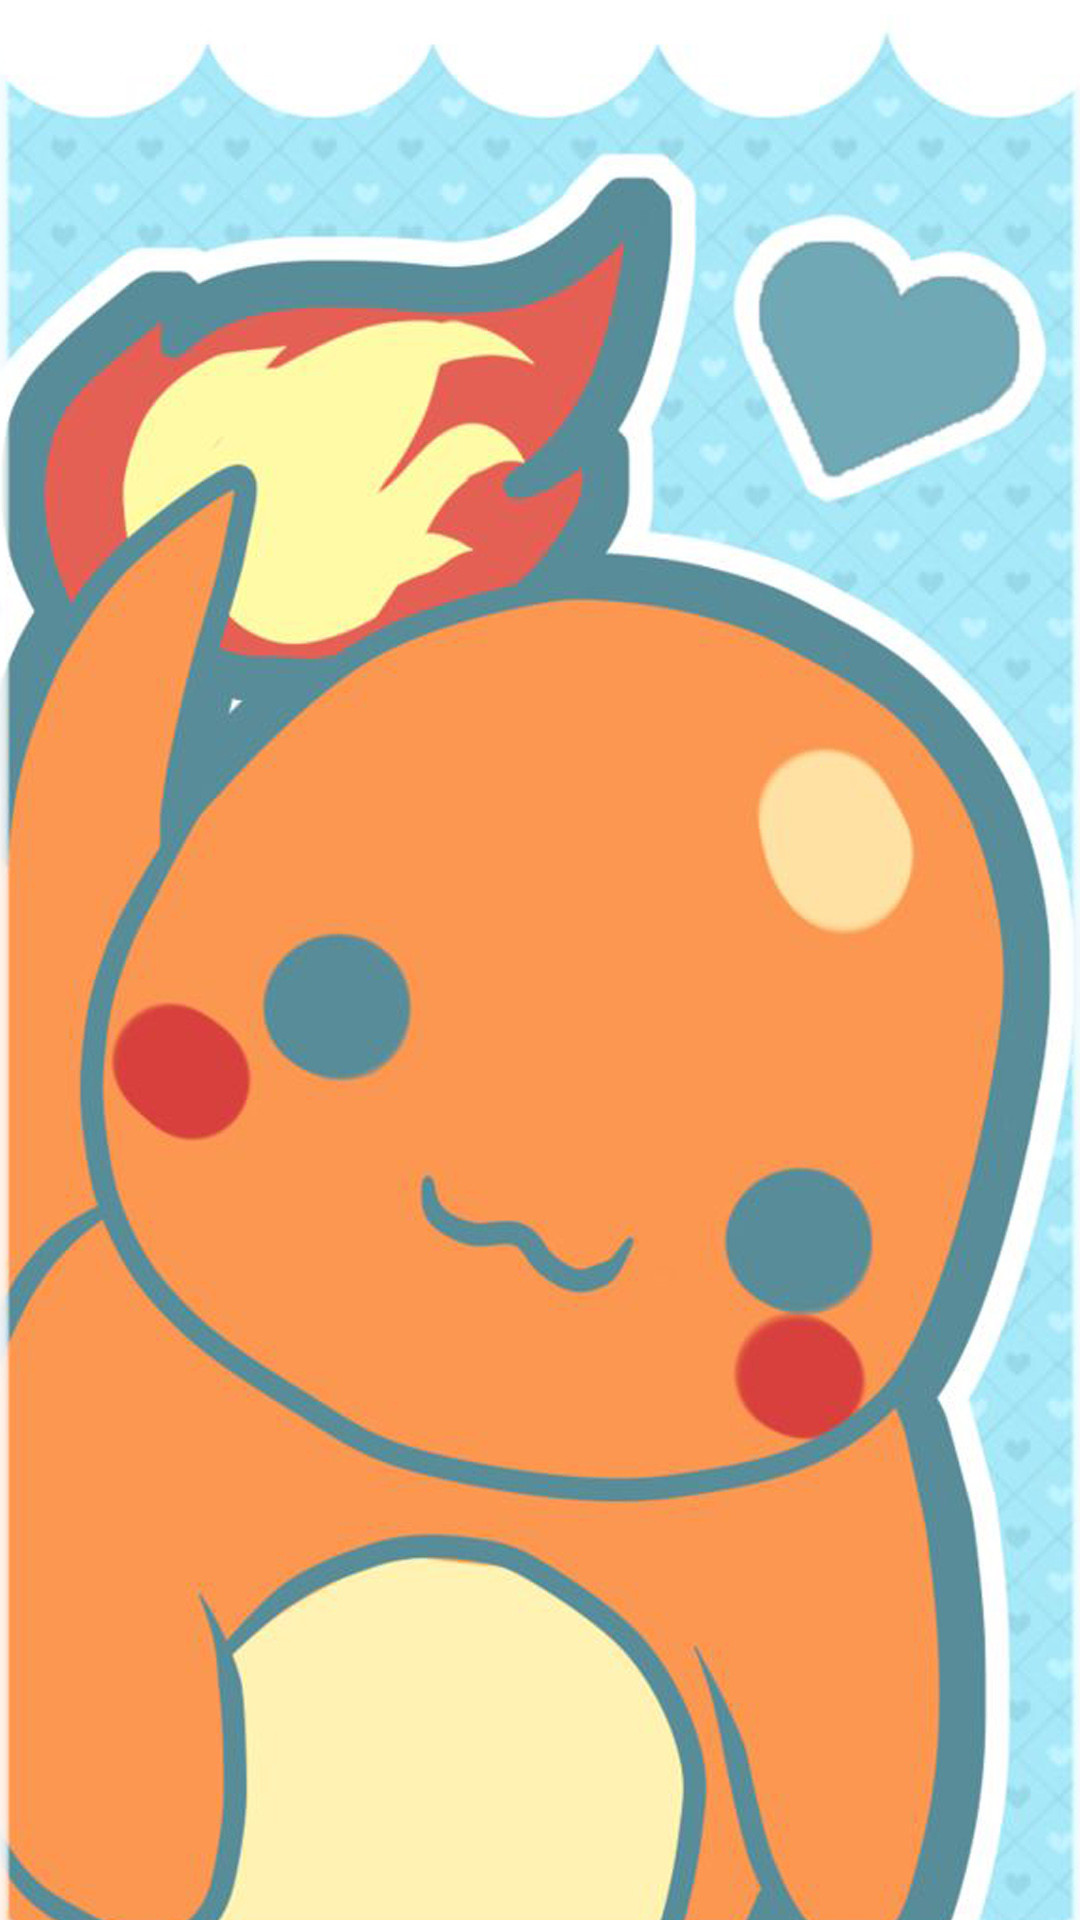 … Charmander Pokemon Go whatsapp wallpapers iphone hd